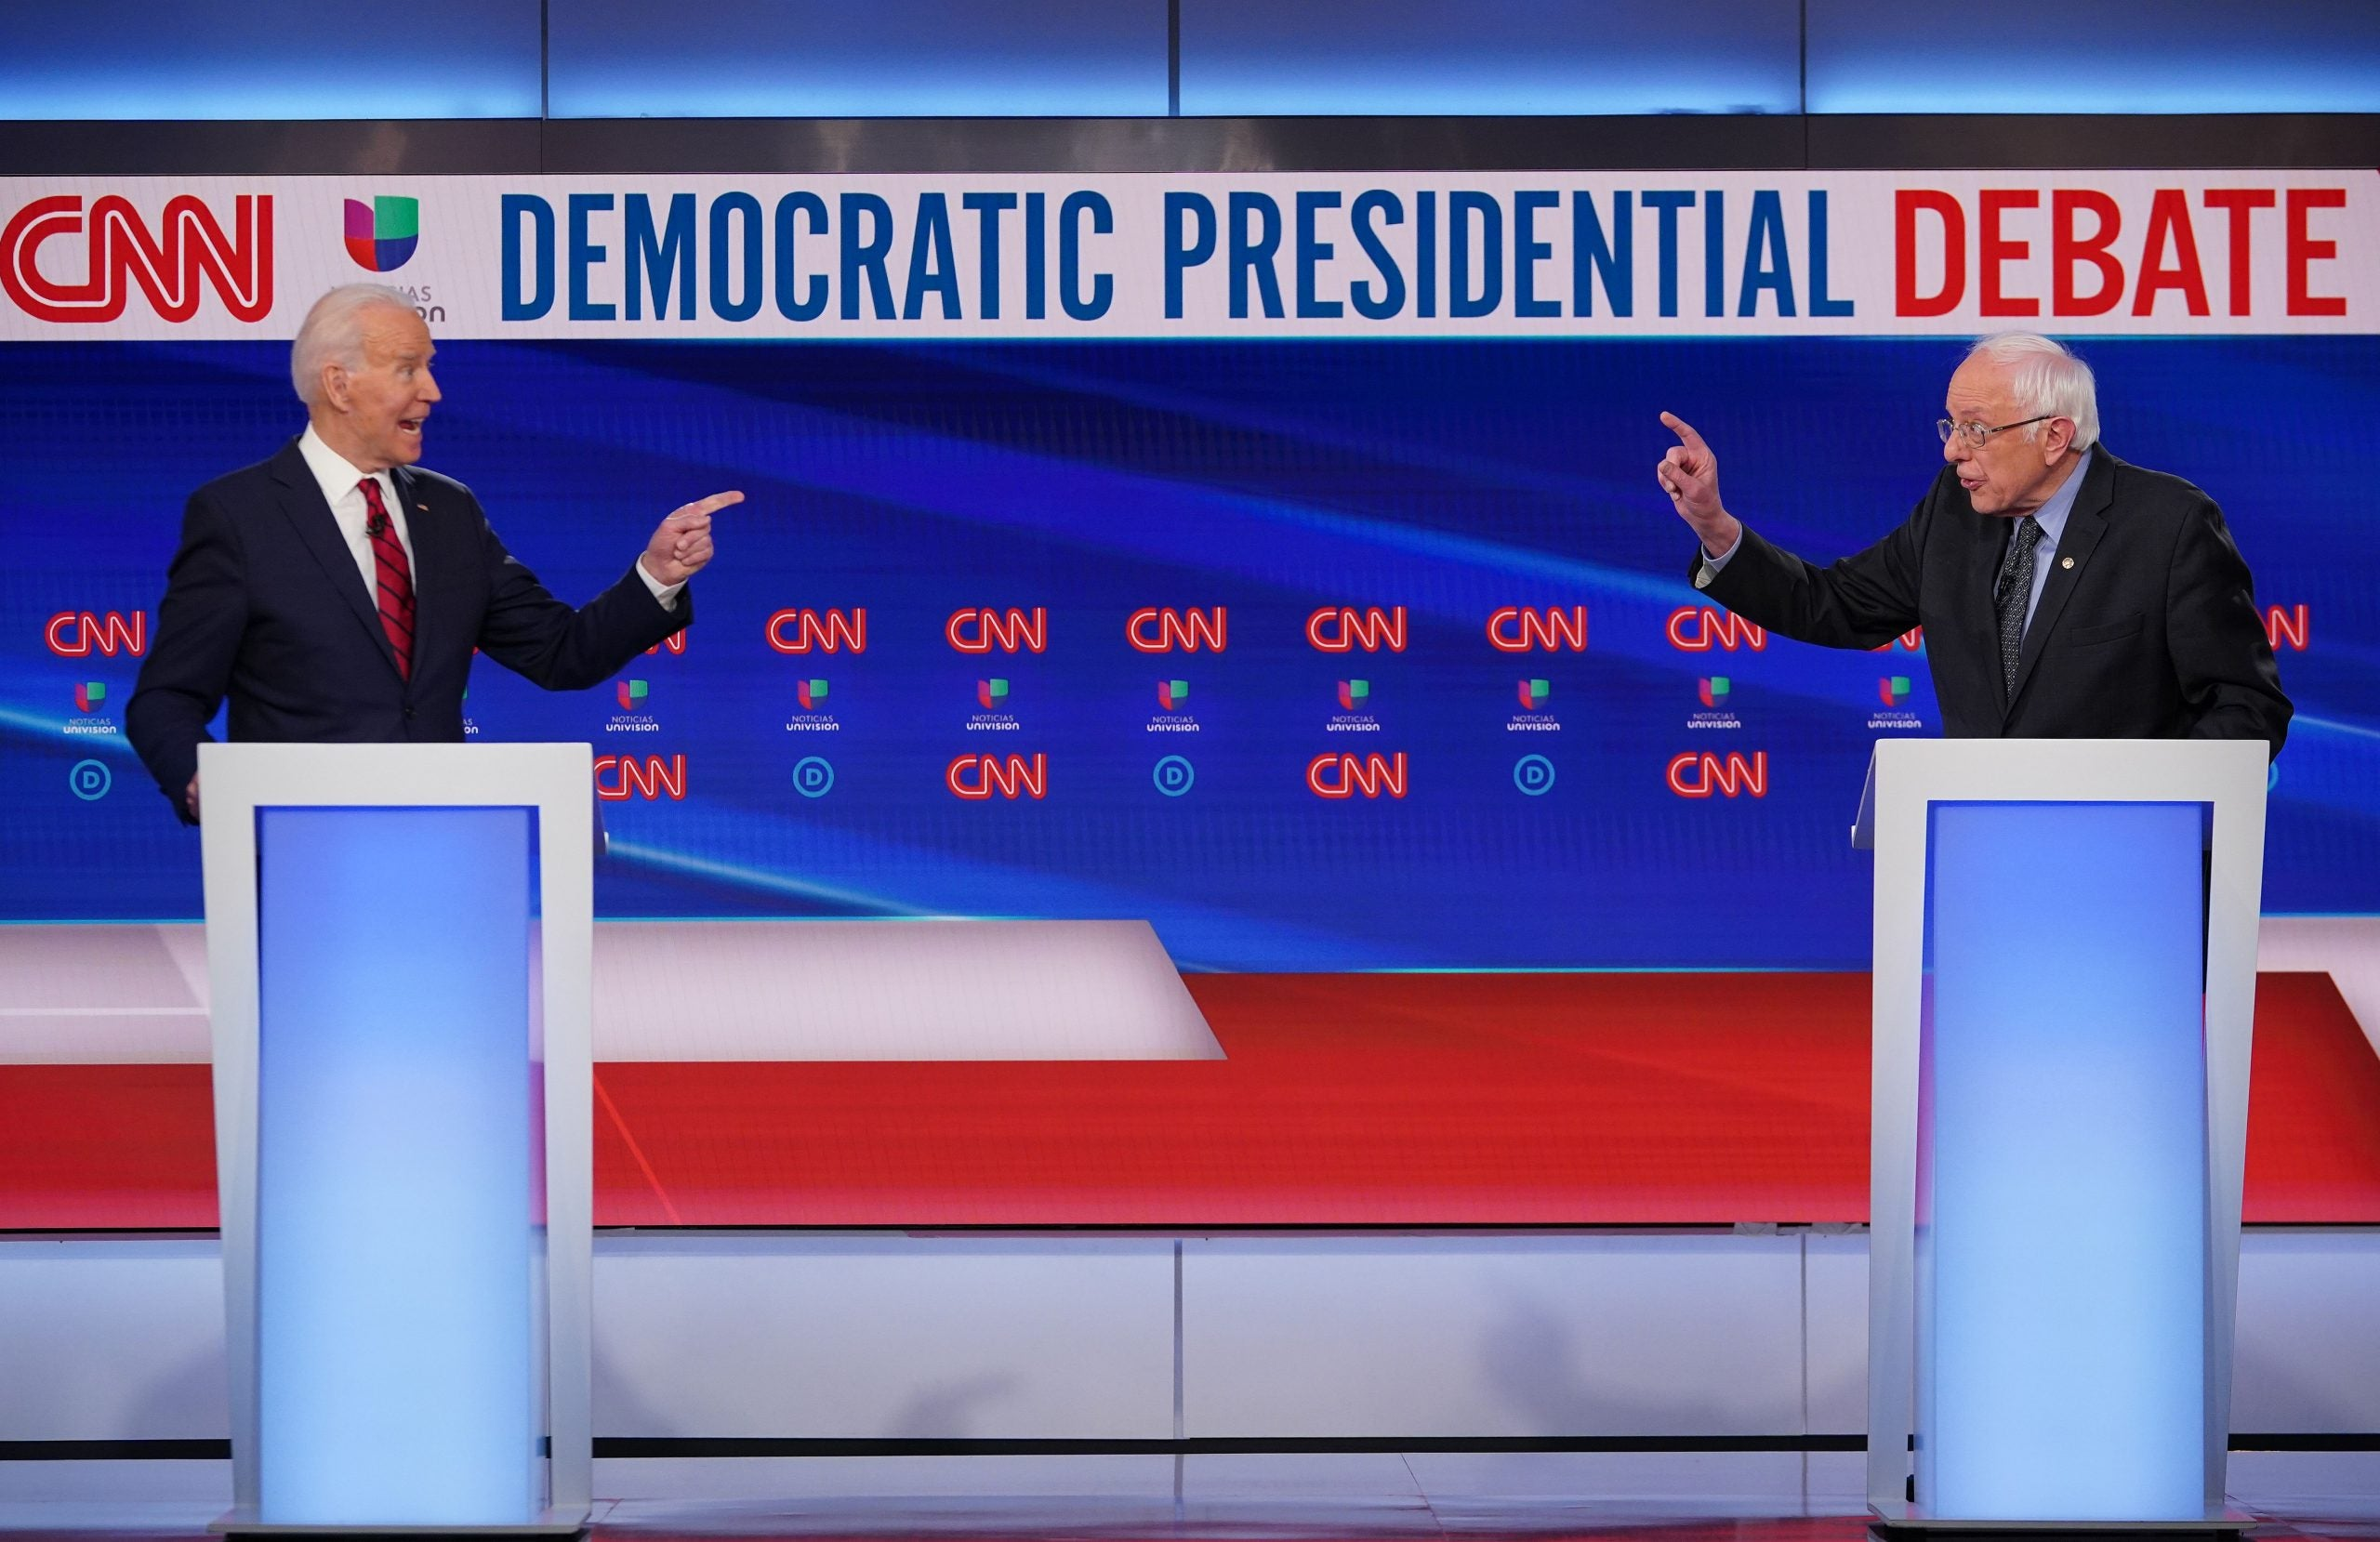 Democratic presidential hopefuls former US vice president Joe Biden (L) and Senator Bernie Sanders (Photo by MANDEL NGAN/AFP via Getty Images)